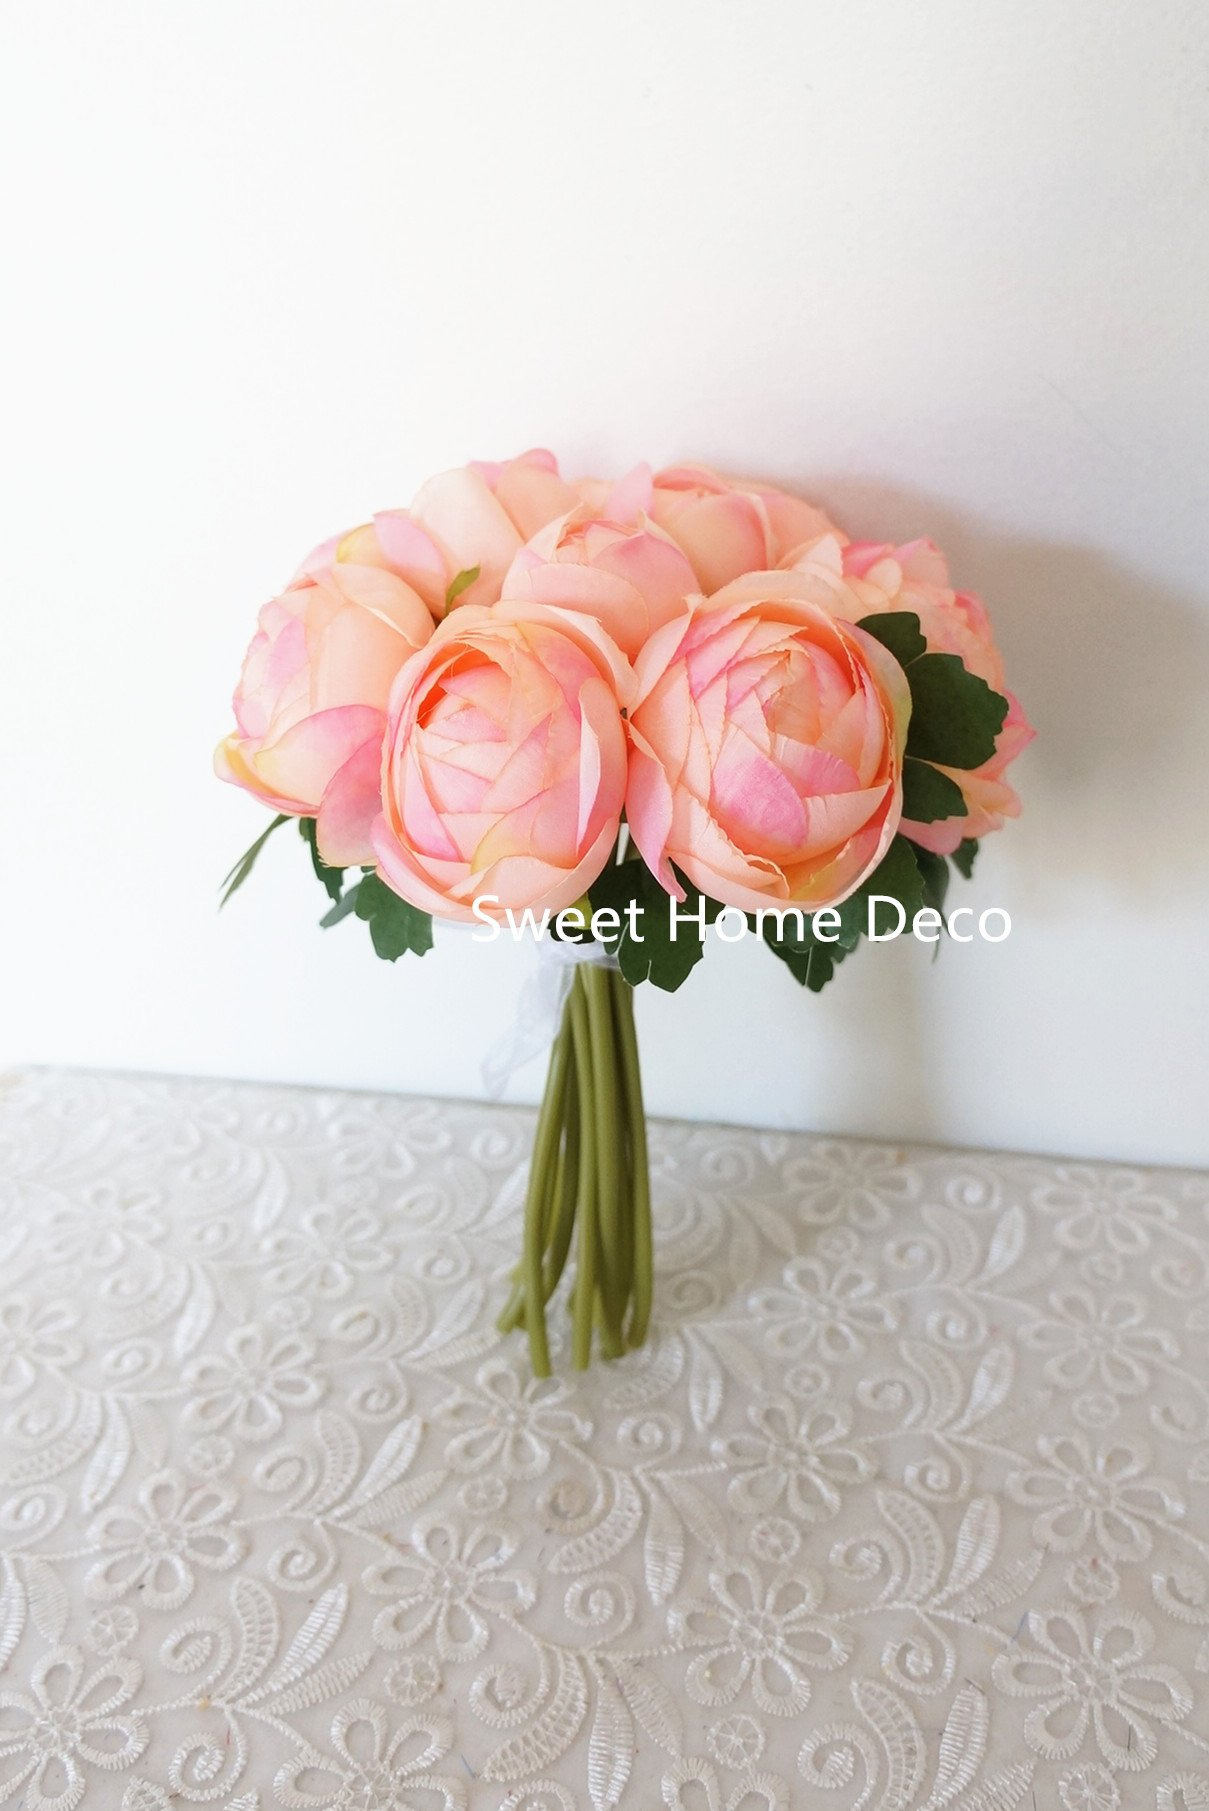 Sweet-Home-Deco-9-Soft-Silk-Ranunculus-Flower-Bouquet-10-Stems10-Flower-Heads-for-WeddingHome-Decorations